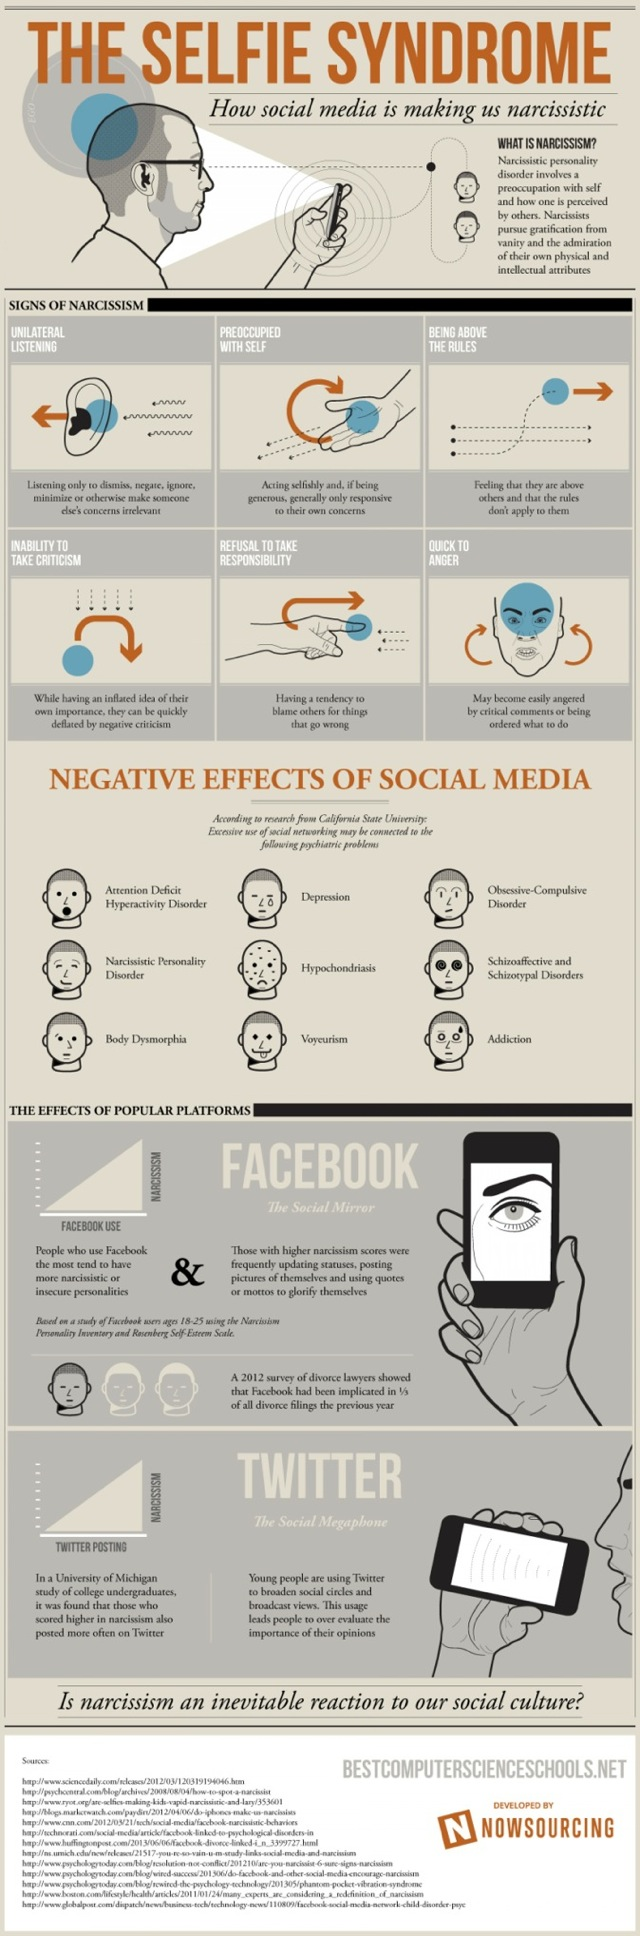 selfie-syndrome-social-media-narcissistic